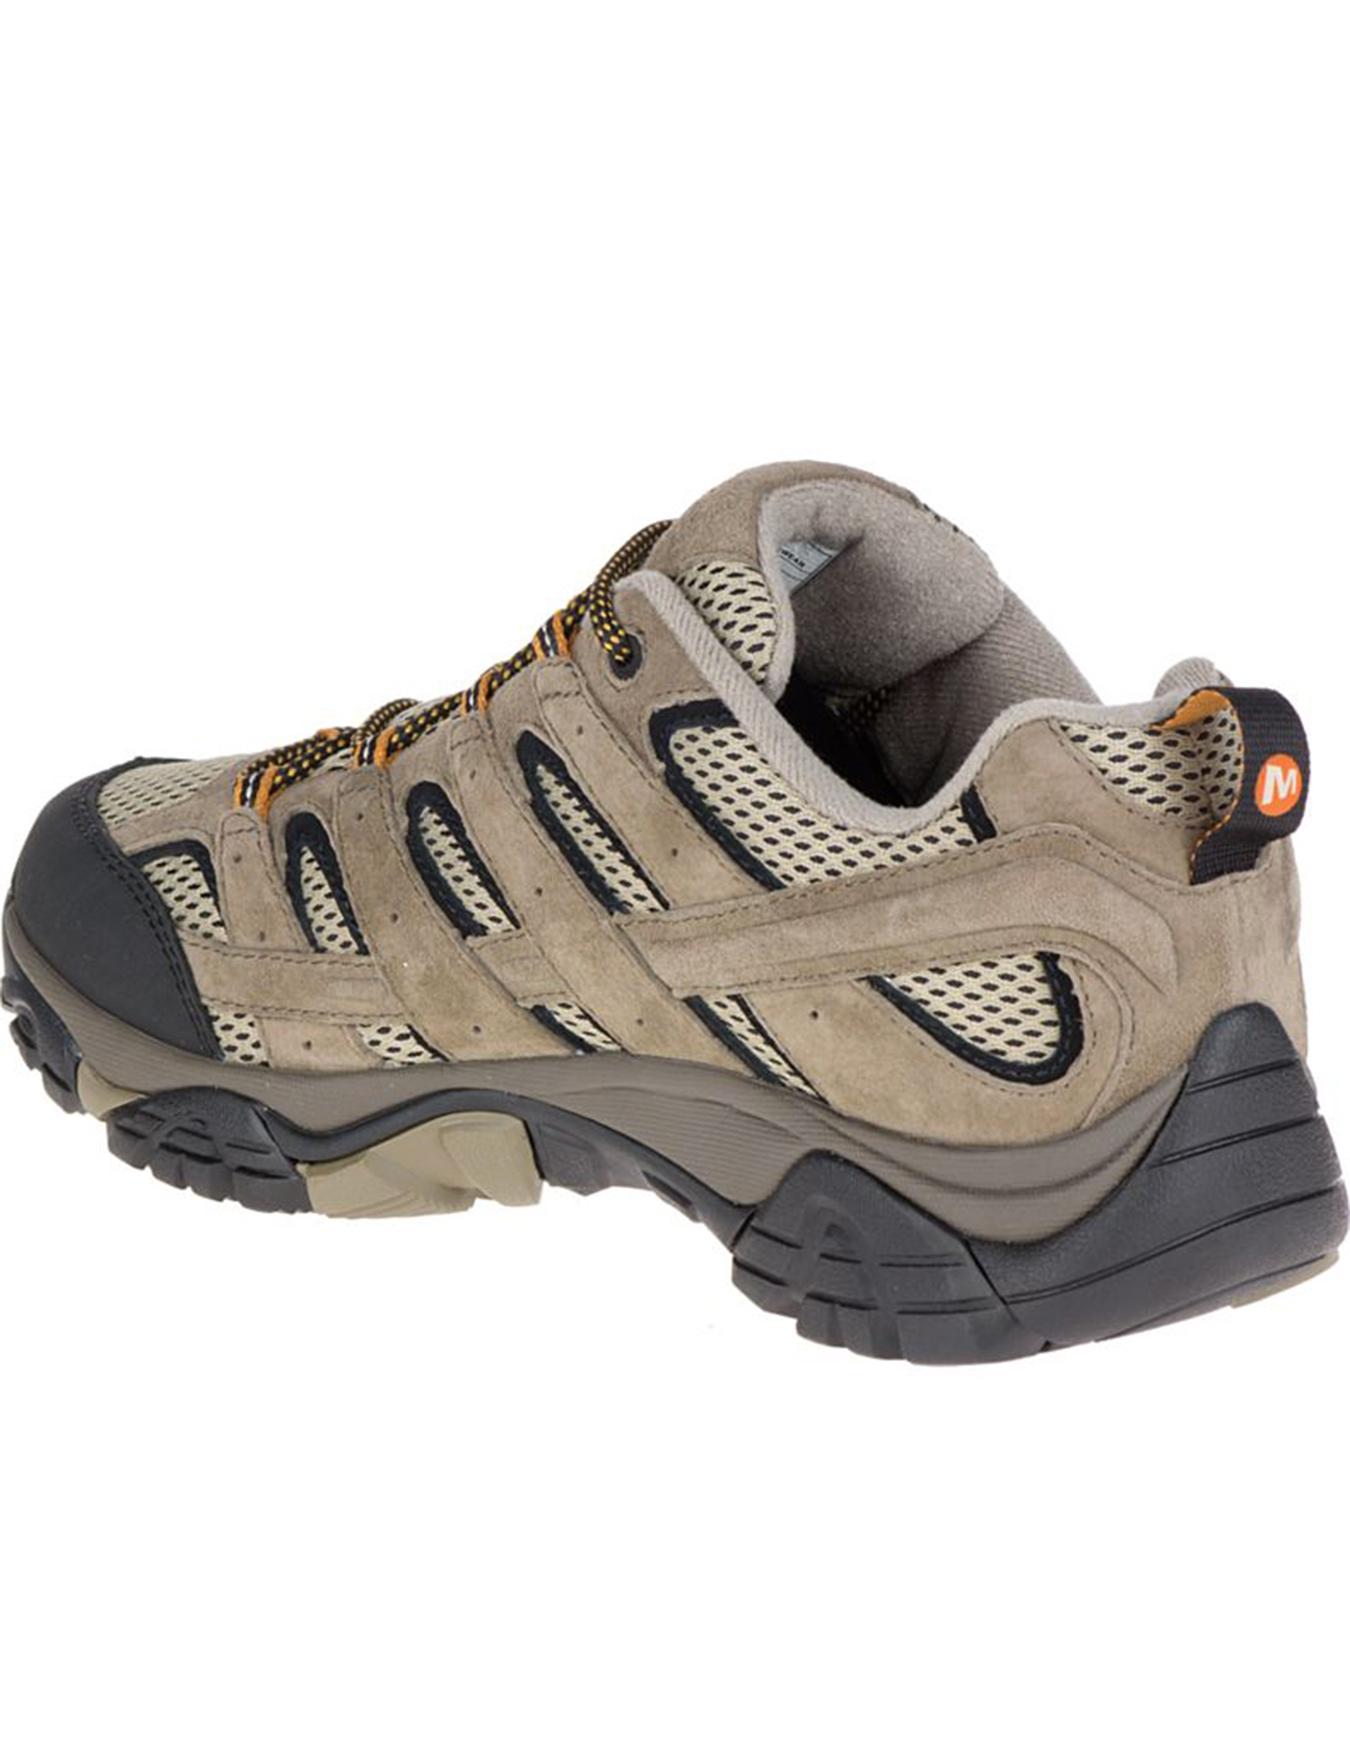 b52bb912a09 Moab 2 Vent Pecan Merrell   Chaussures randonnée homme   Snowleader